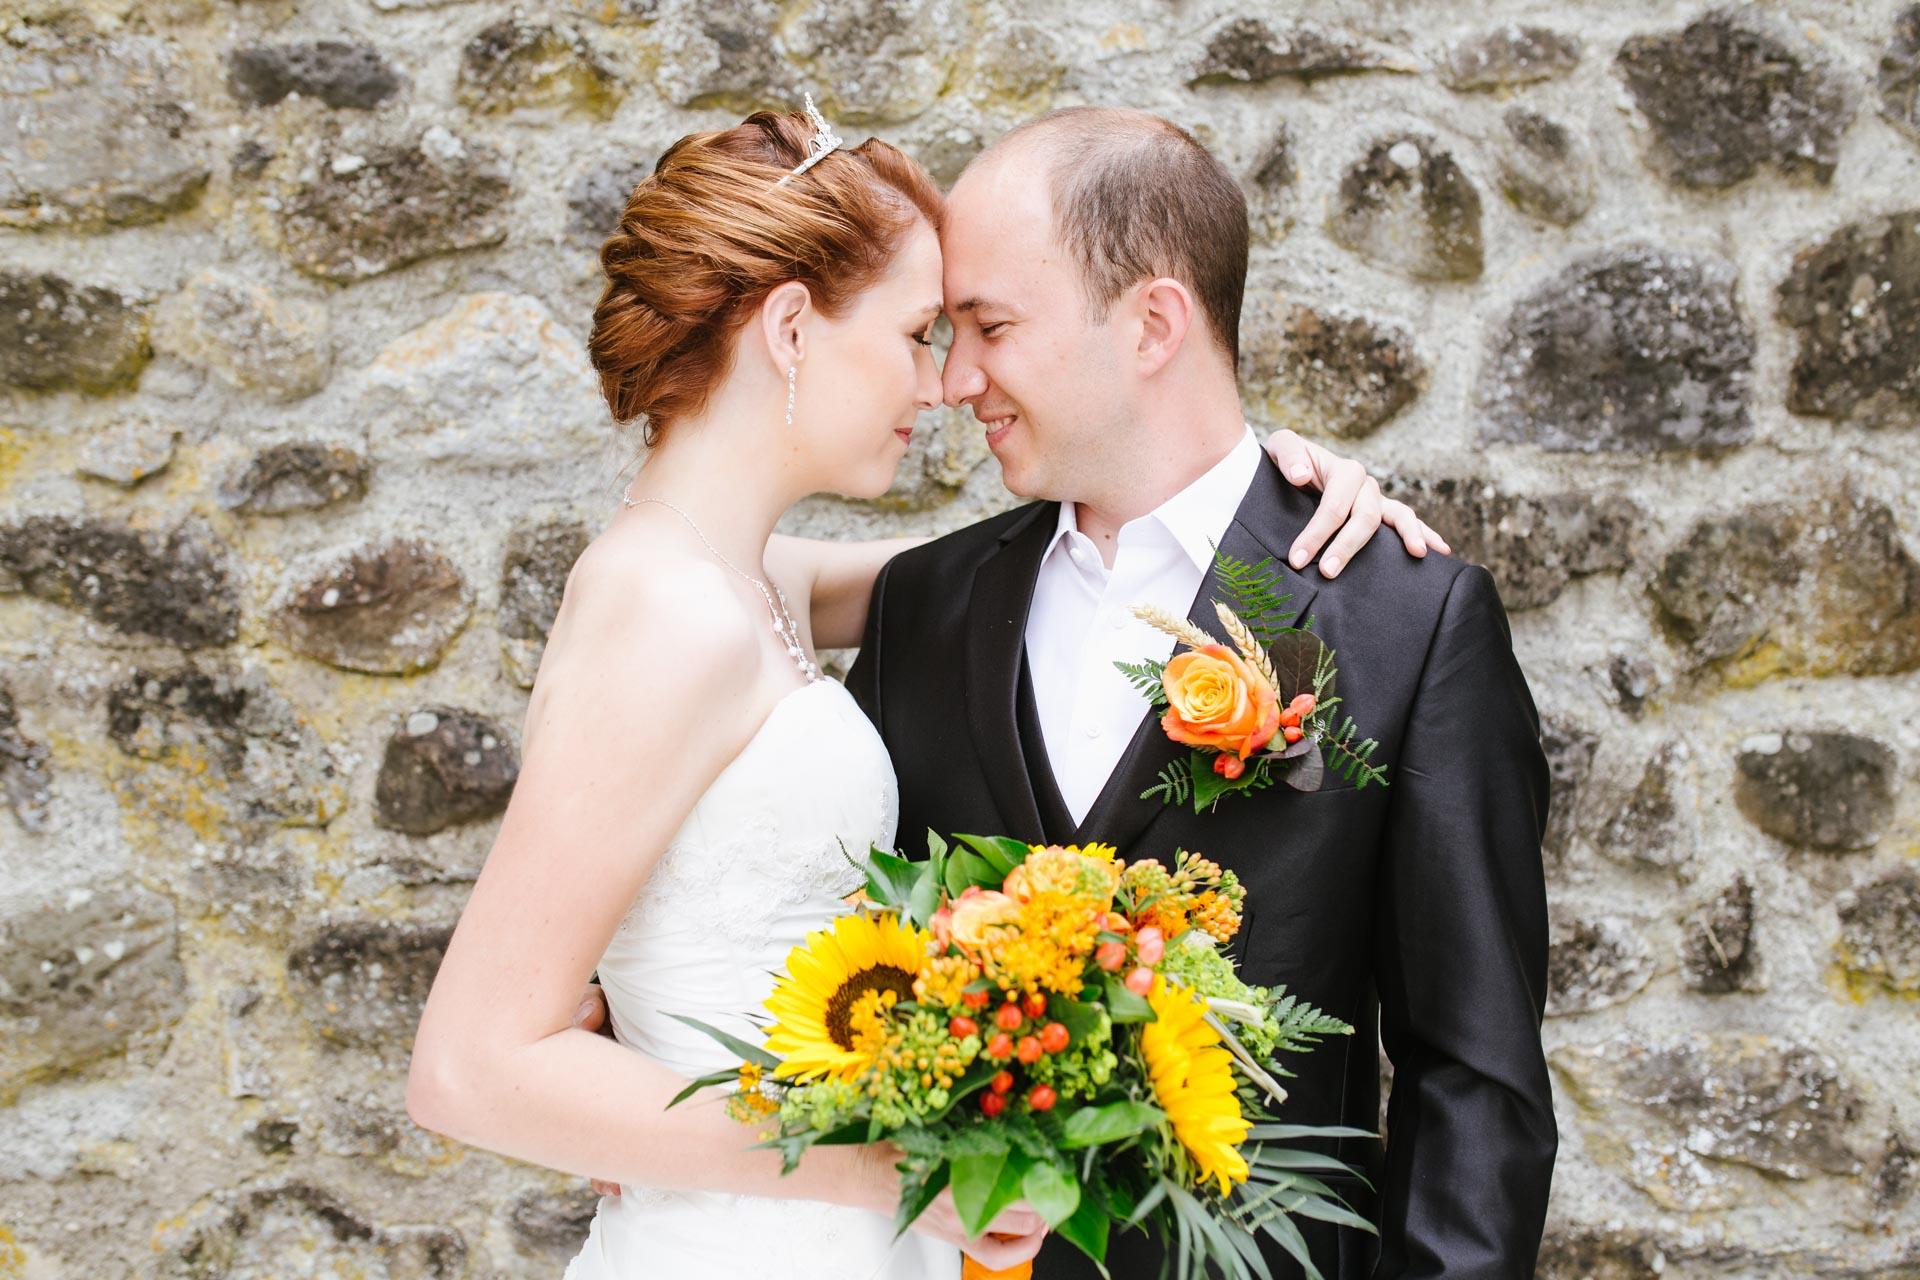 Pixelart_Hochzeitsfotografen_Loerrach_Rheinfelden_Hallwil_Schweiz_Linda-Ramon-1008